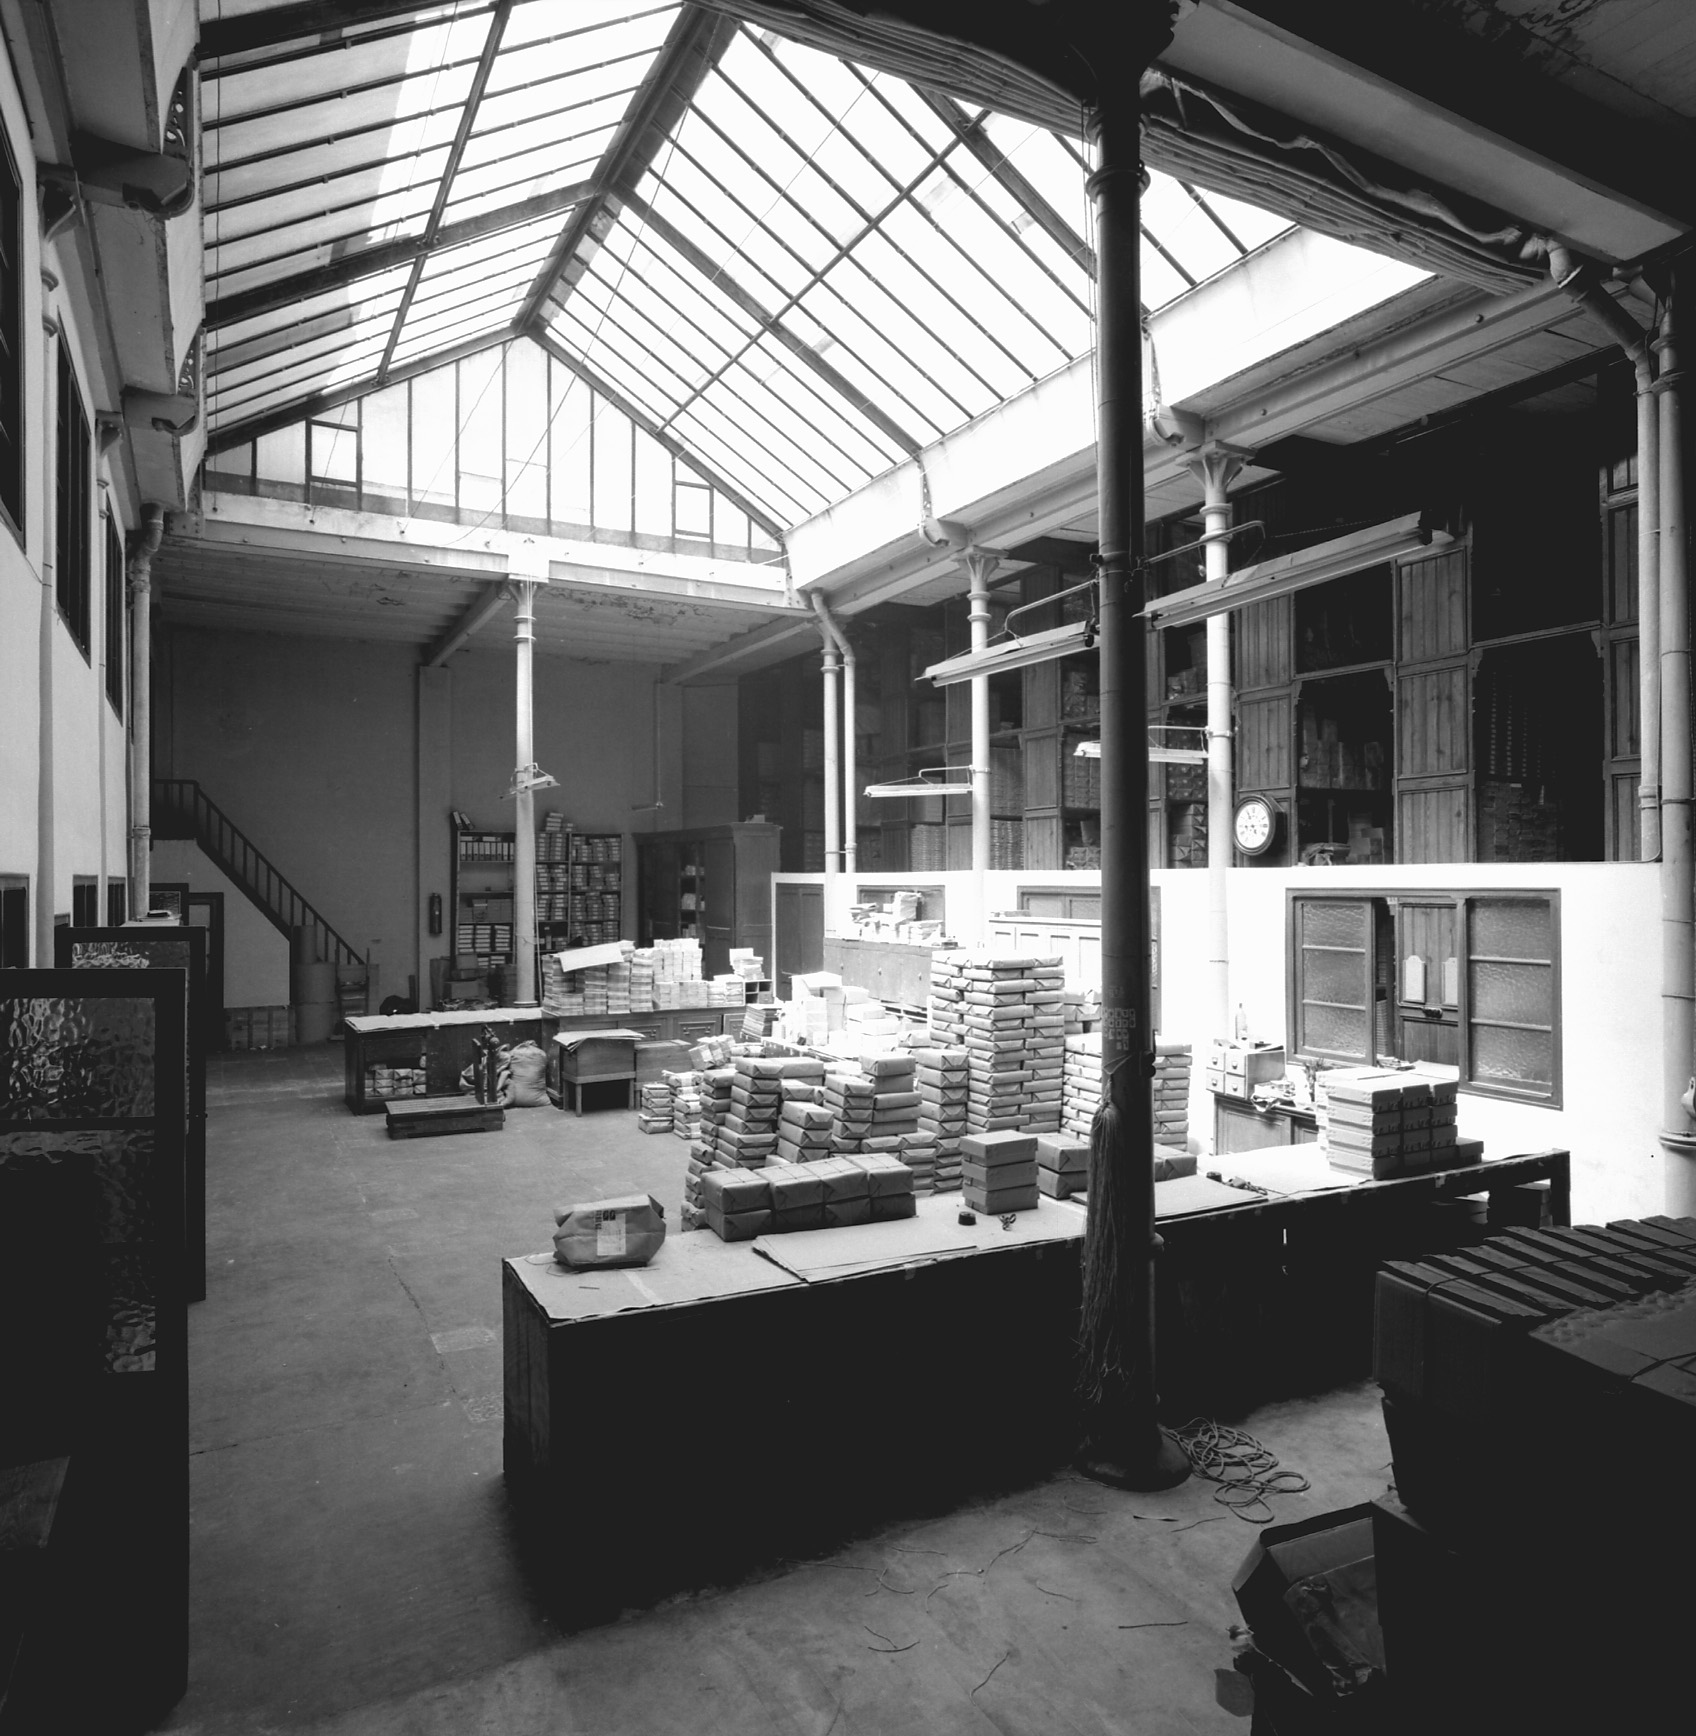 Montaner i simon a publishing house with a history - Cubina barcelona ...